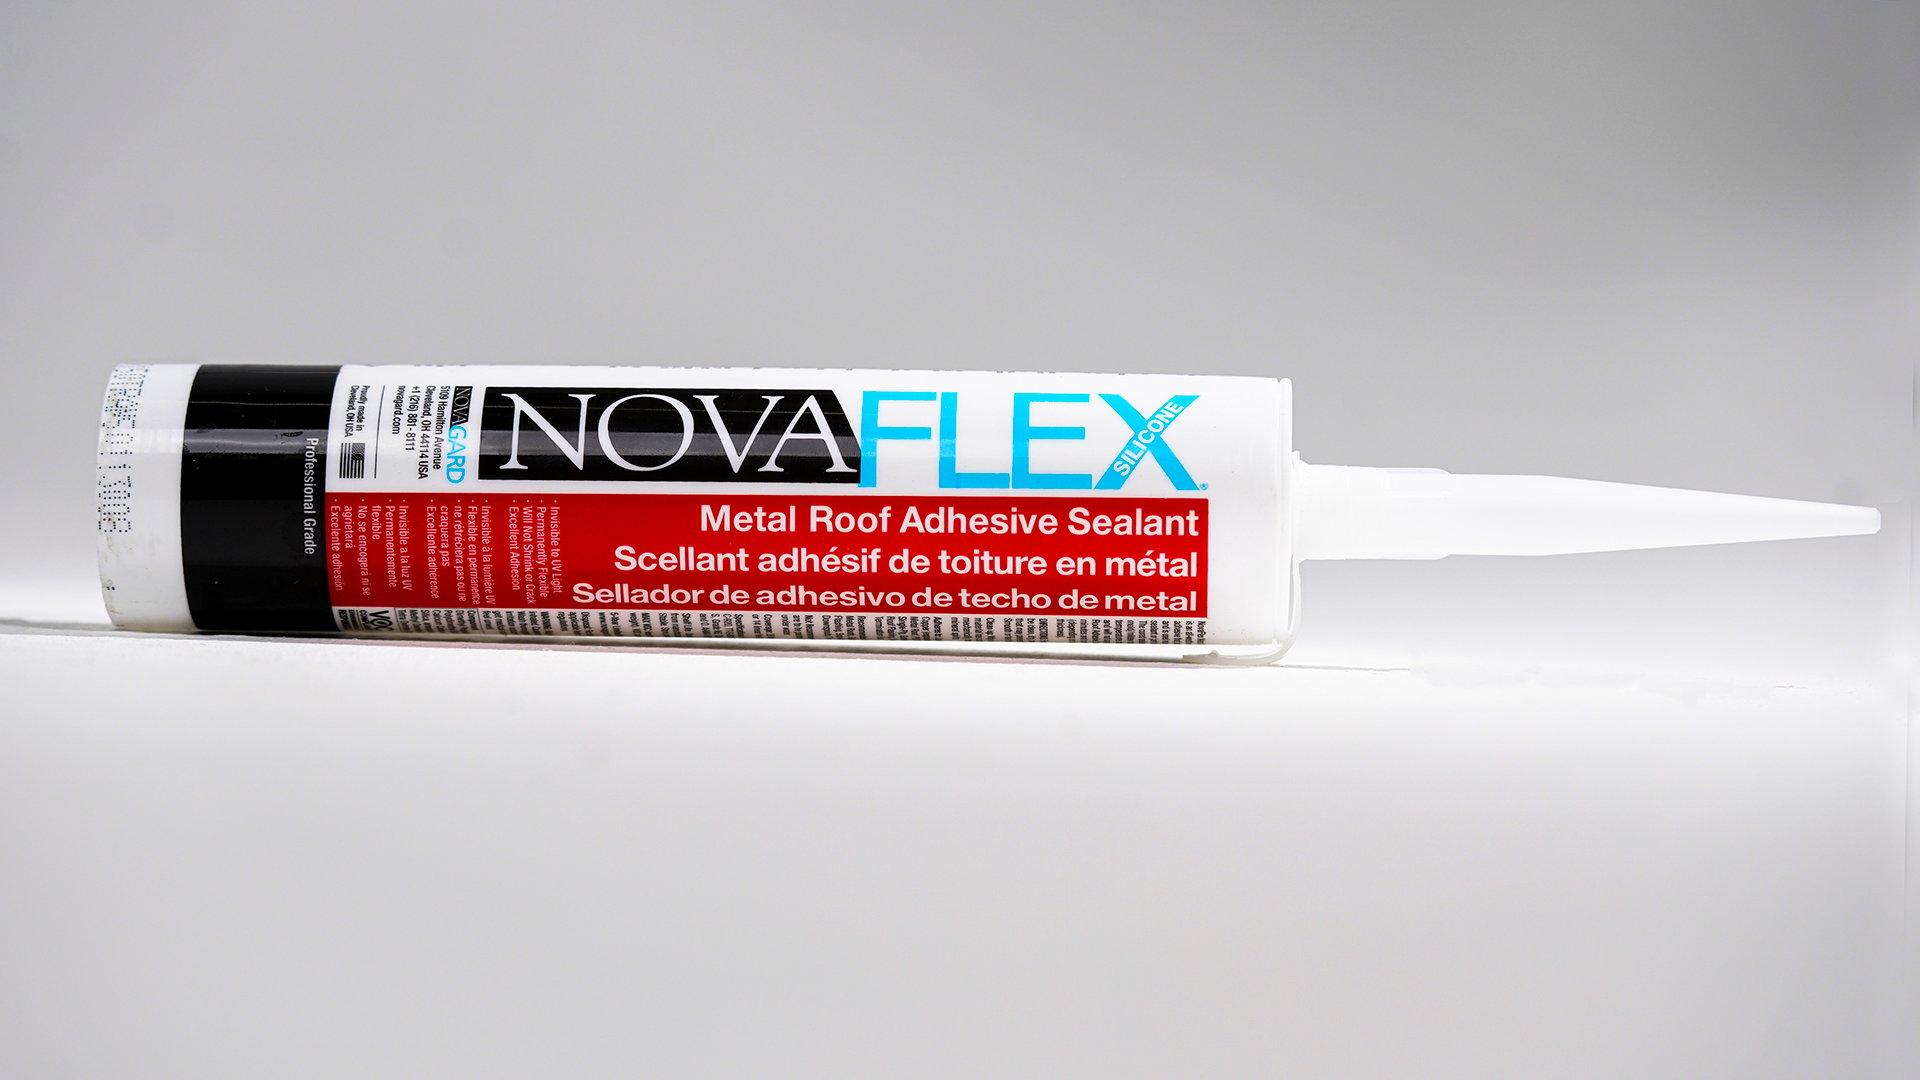 novaflex-metal-roof-adhesive-sealant